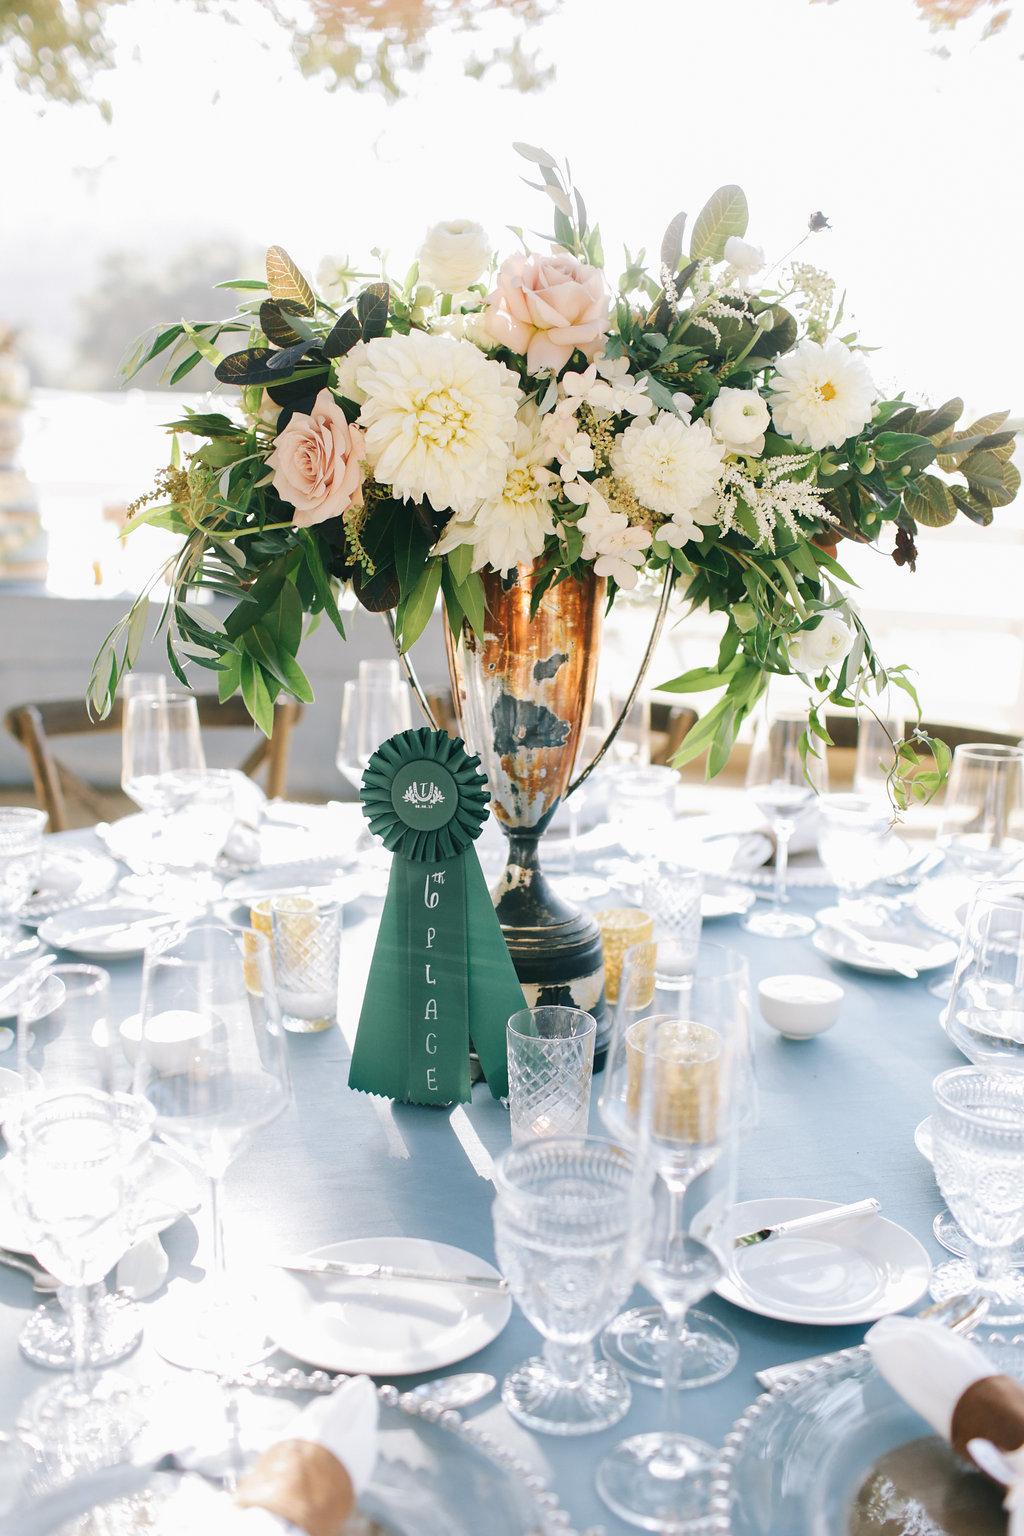 LVL Weddings and Events Brandon Kidd Equestrian Wedding (48).jpg